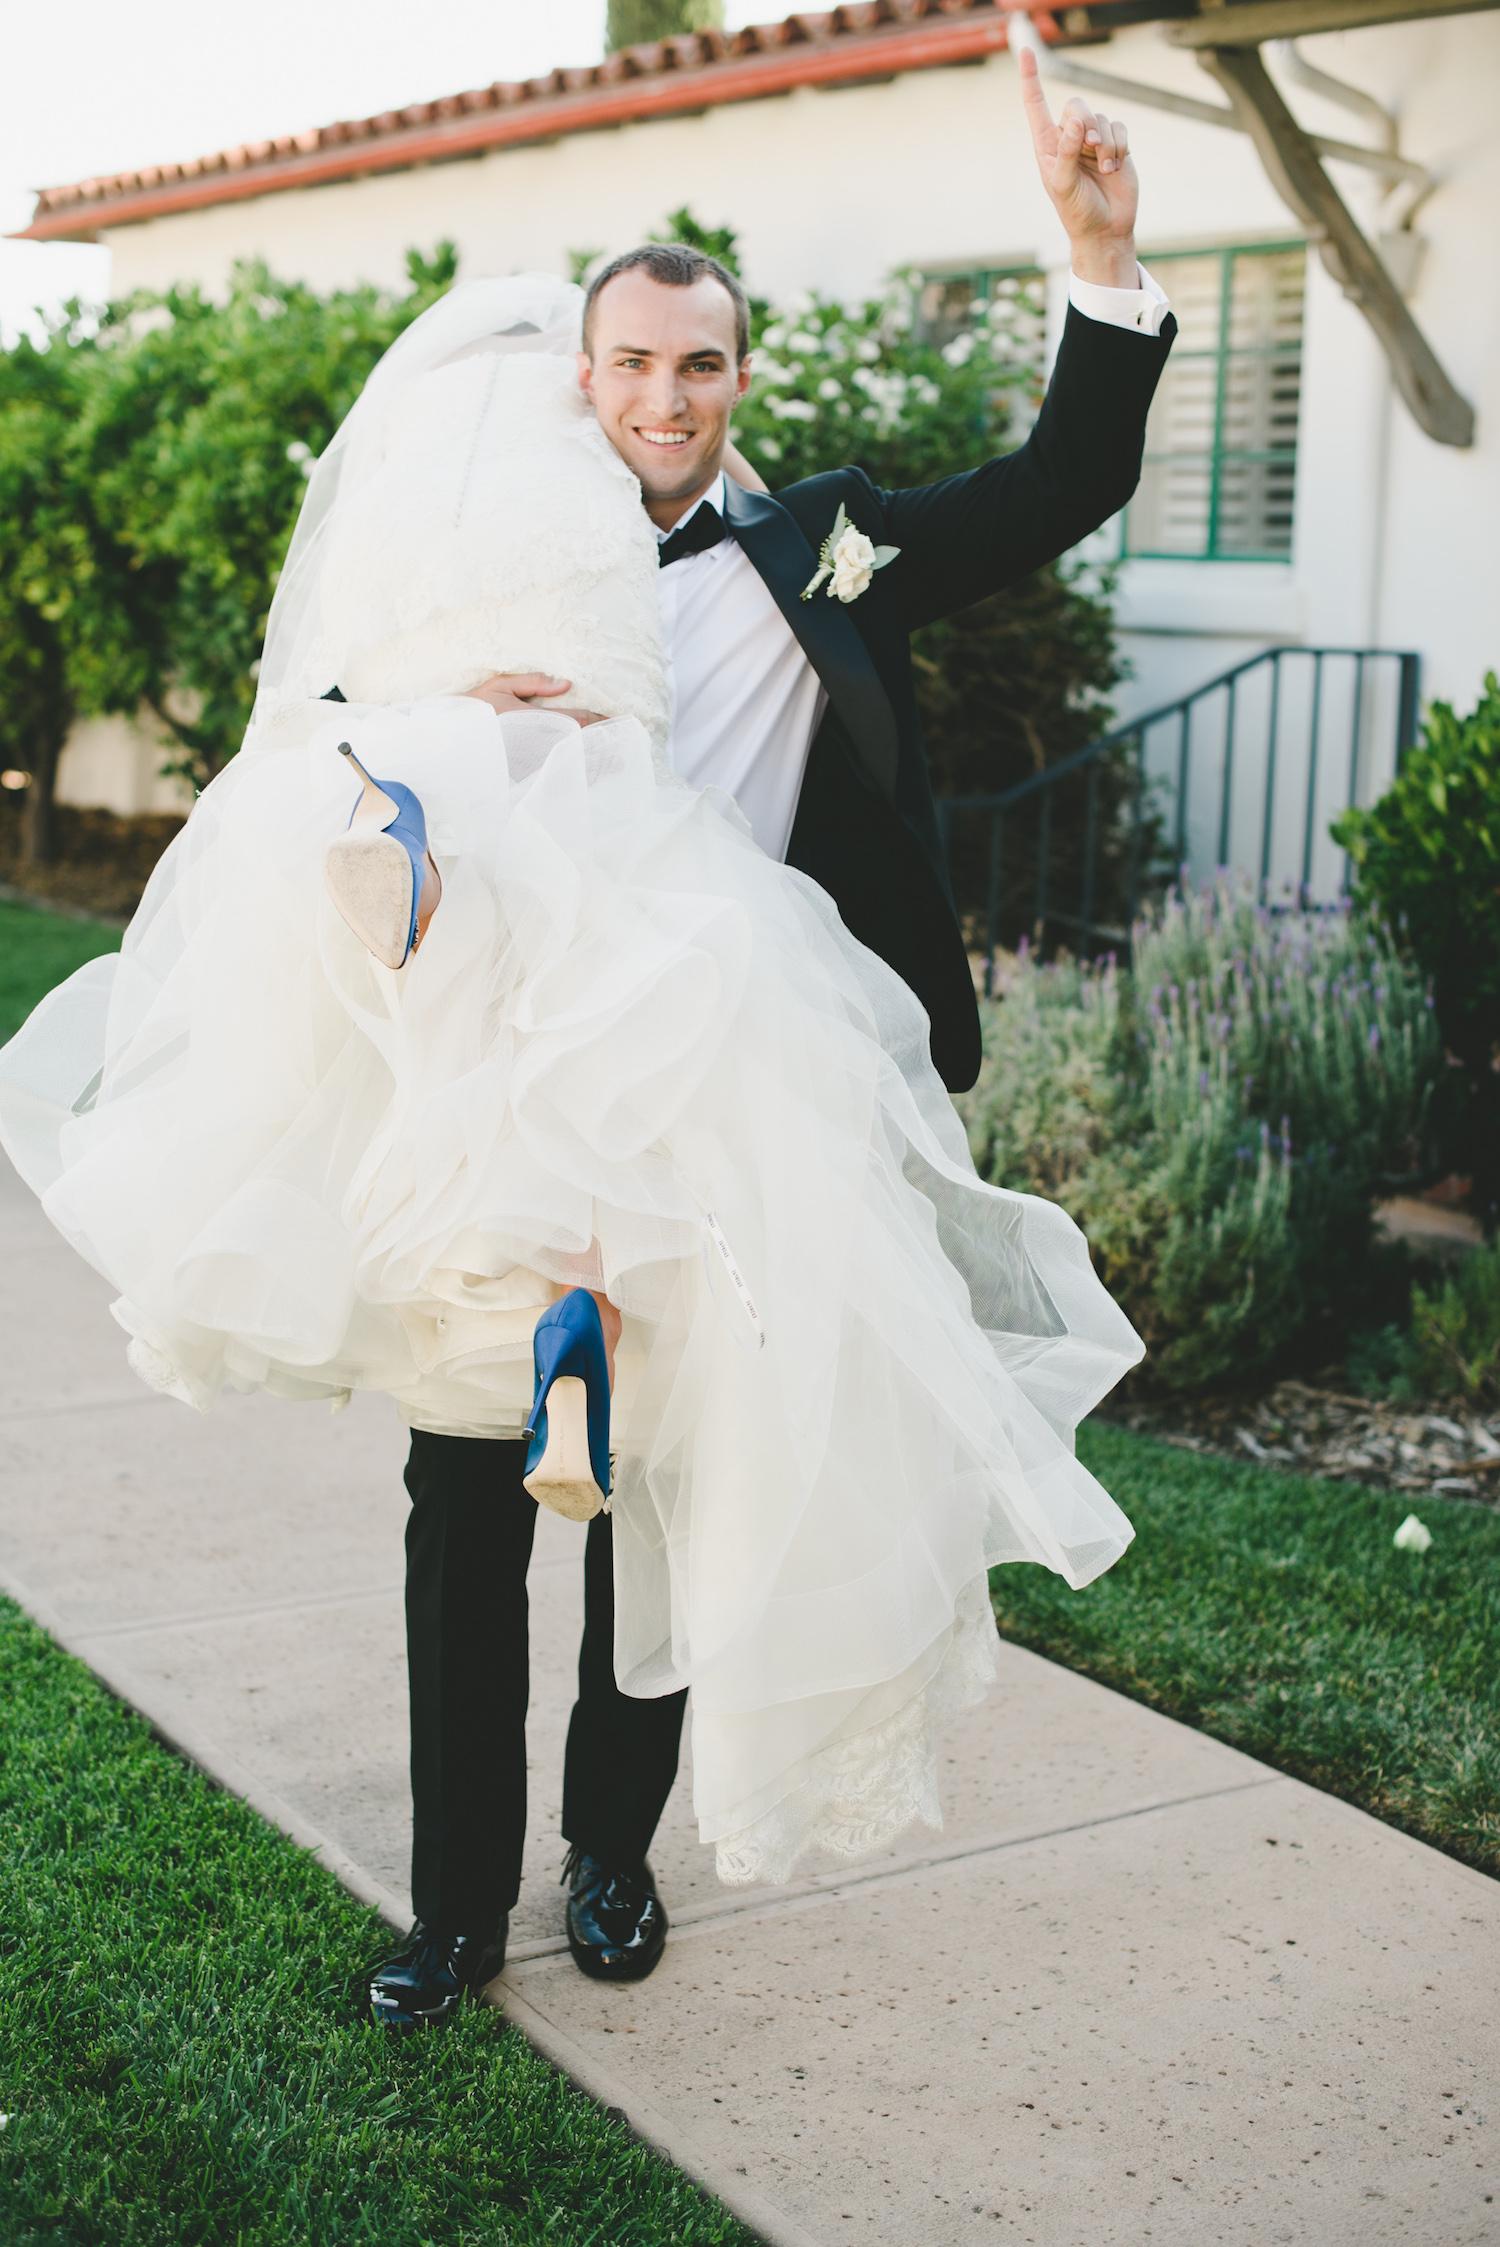 Fun Wedding Photo Ojai Valley Inn